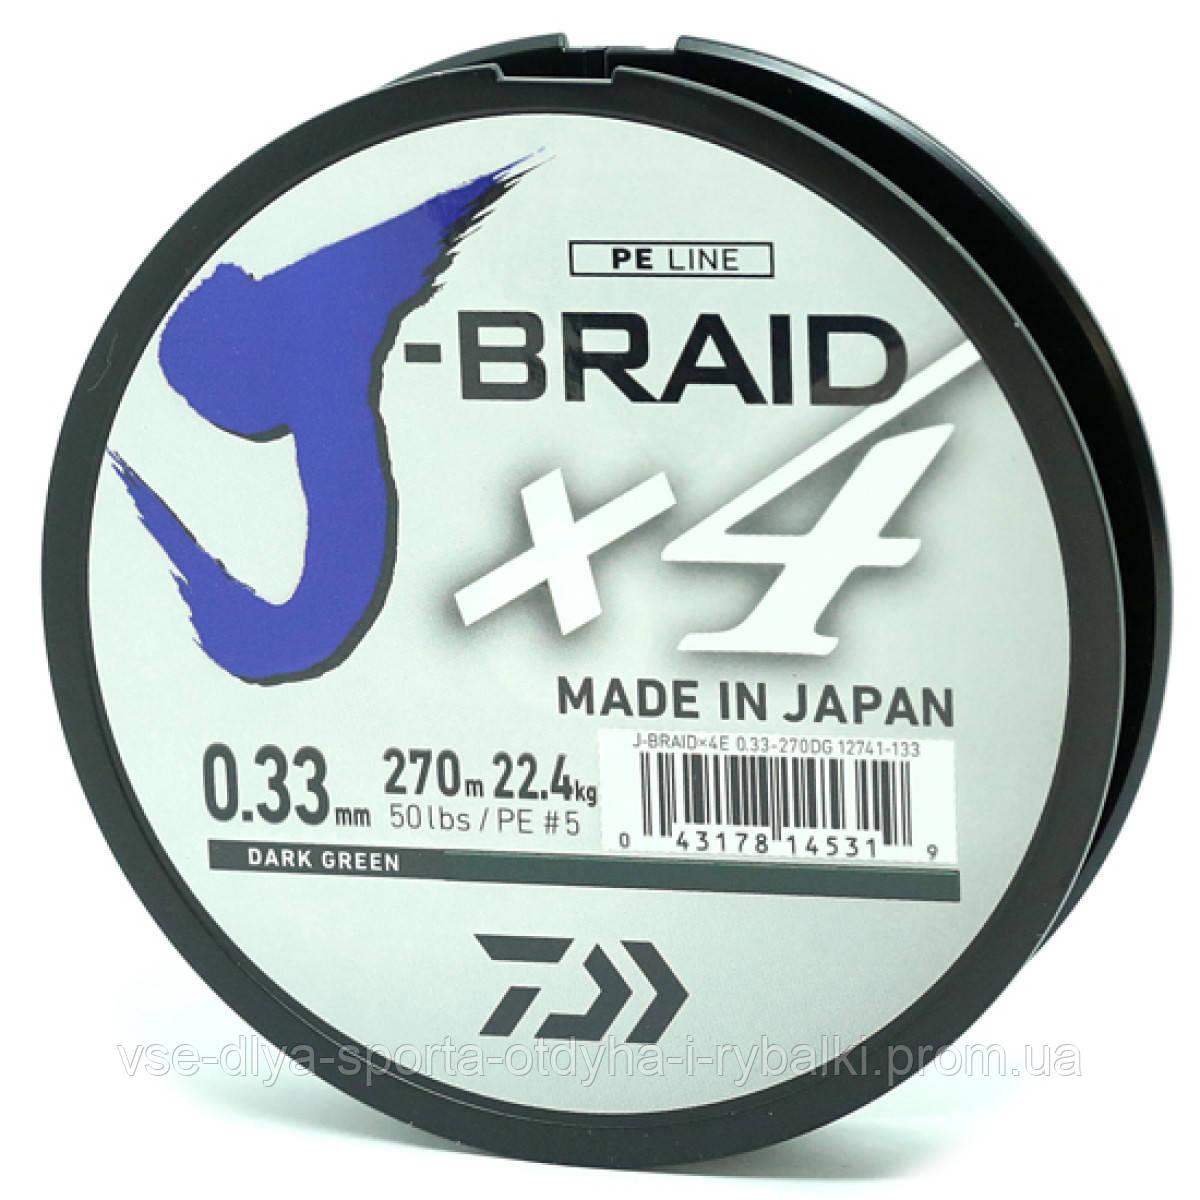 Шнур Daiwa J-Braid X4E 0,33mm-270m Dark Green